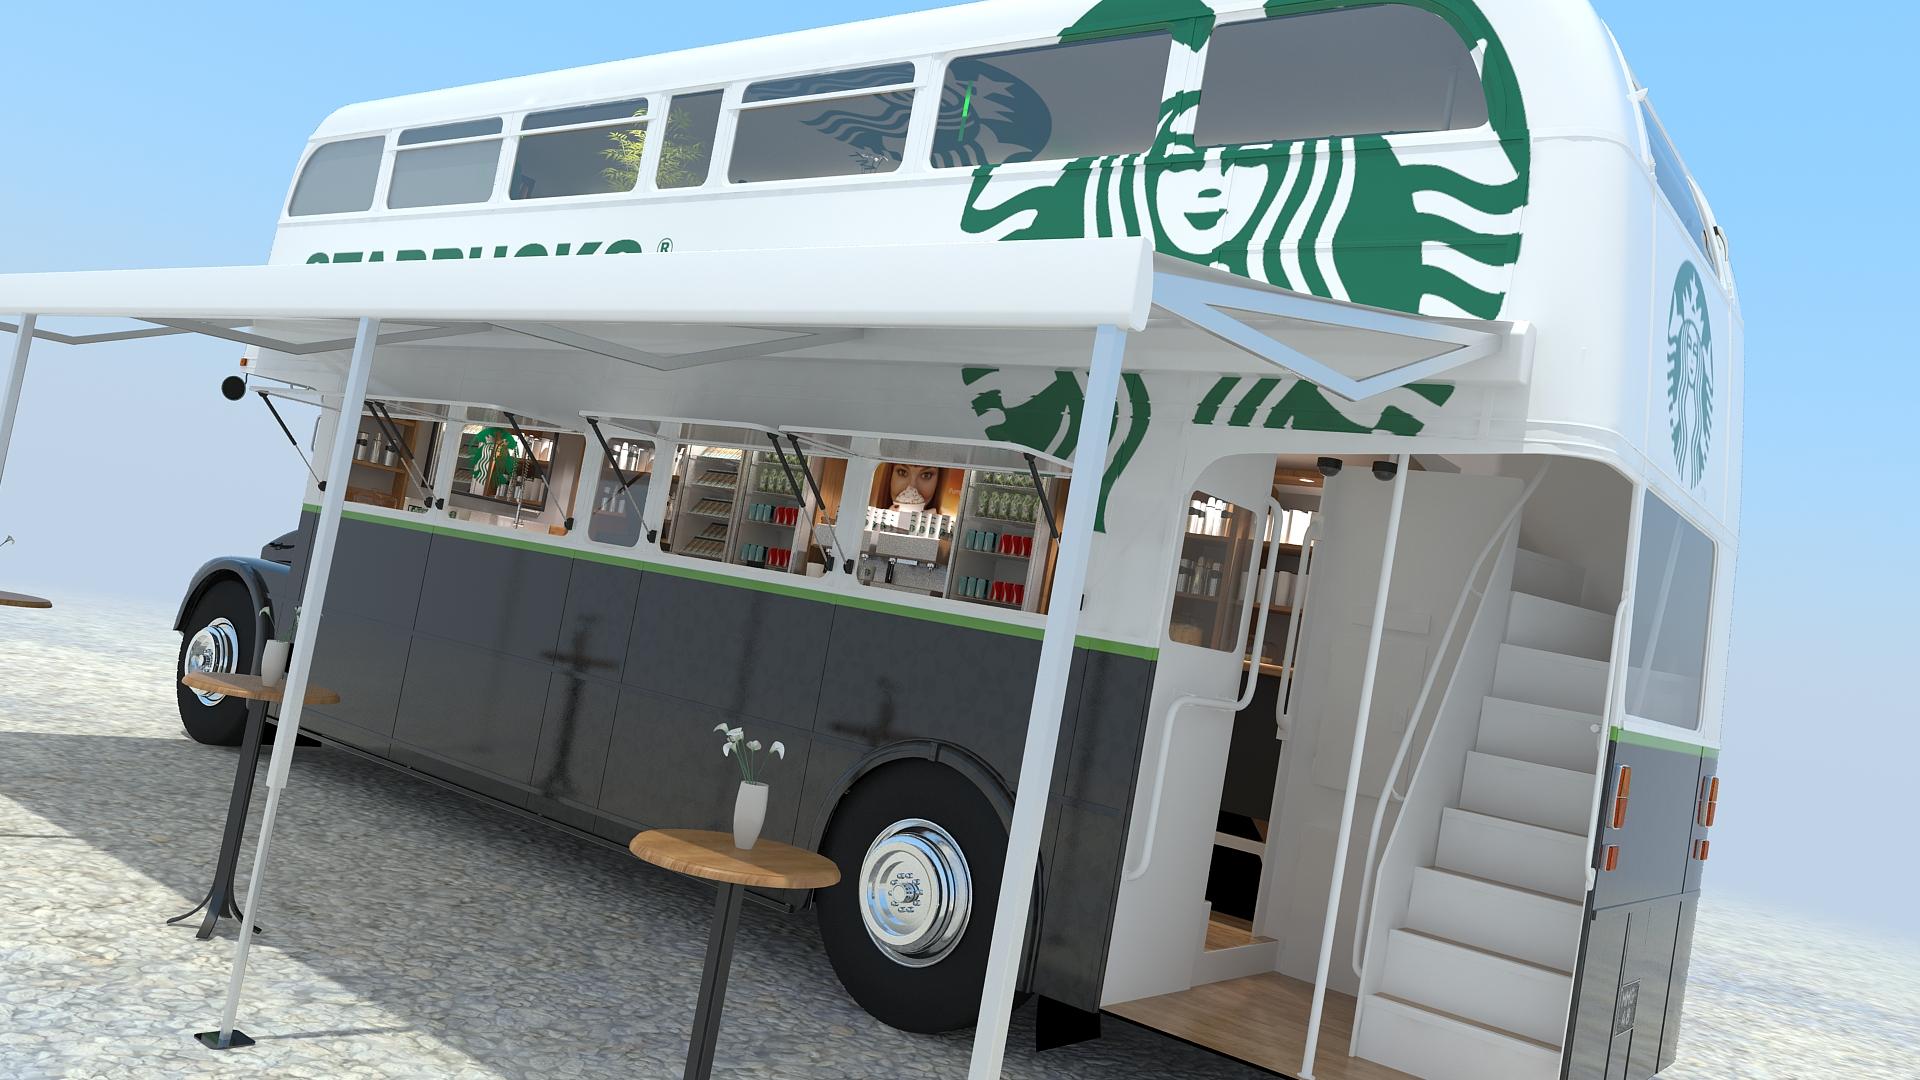 Starbucks Exterior Entrance_02.jpg